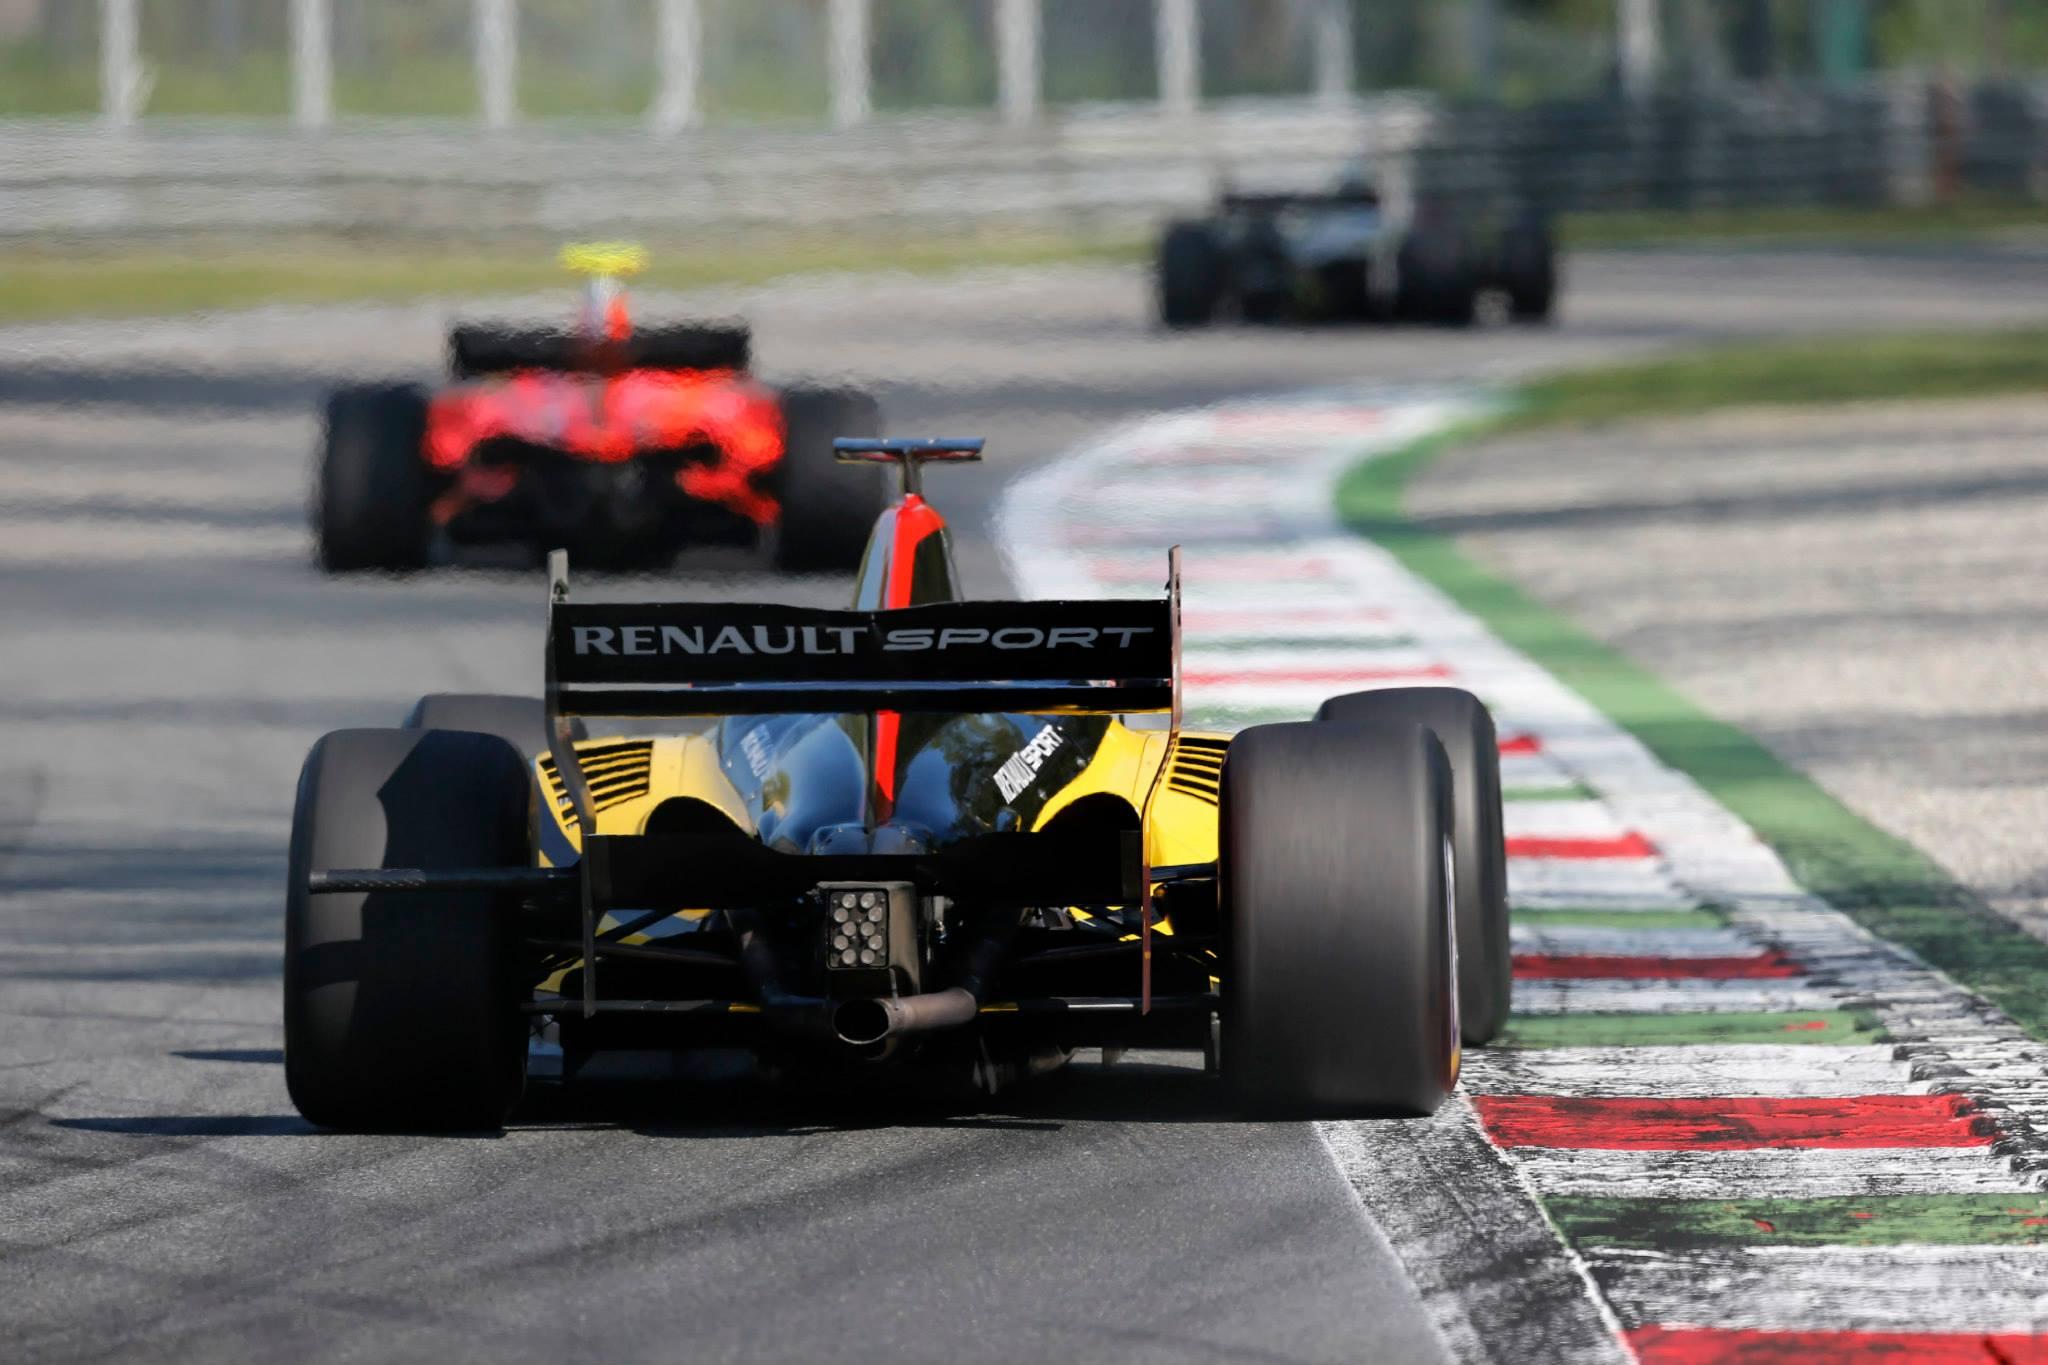 2014 Formula Renault 3.5 Series - Monza - Norman Nato